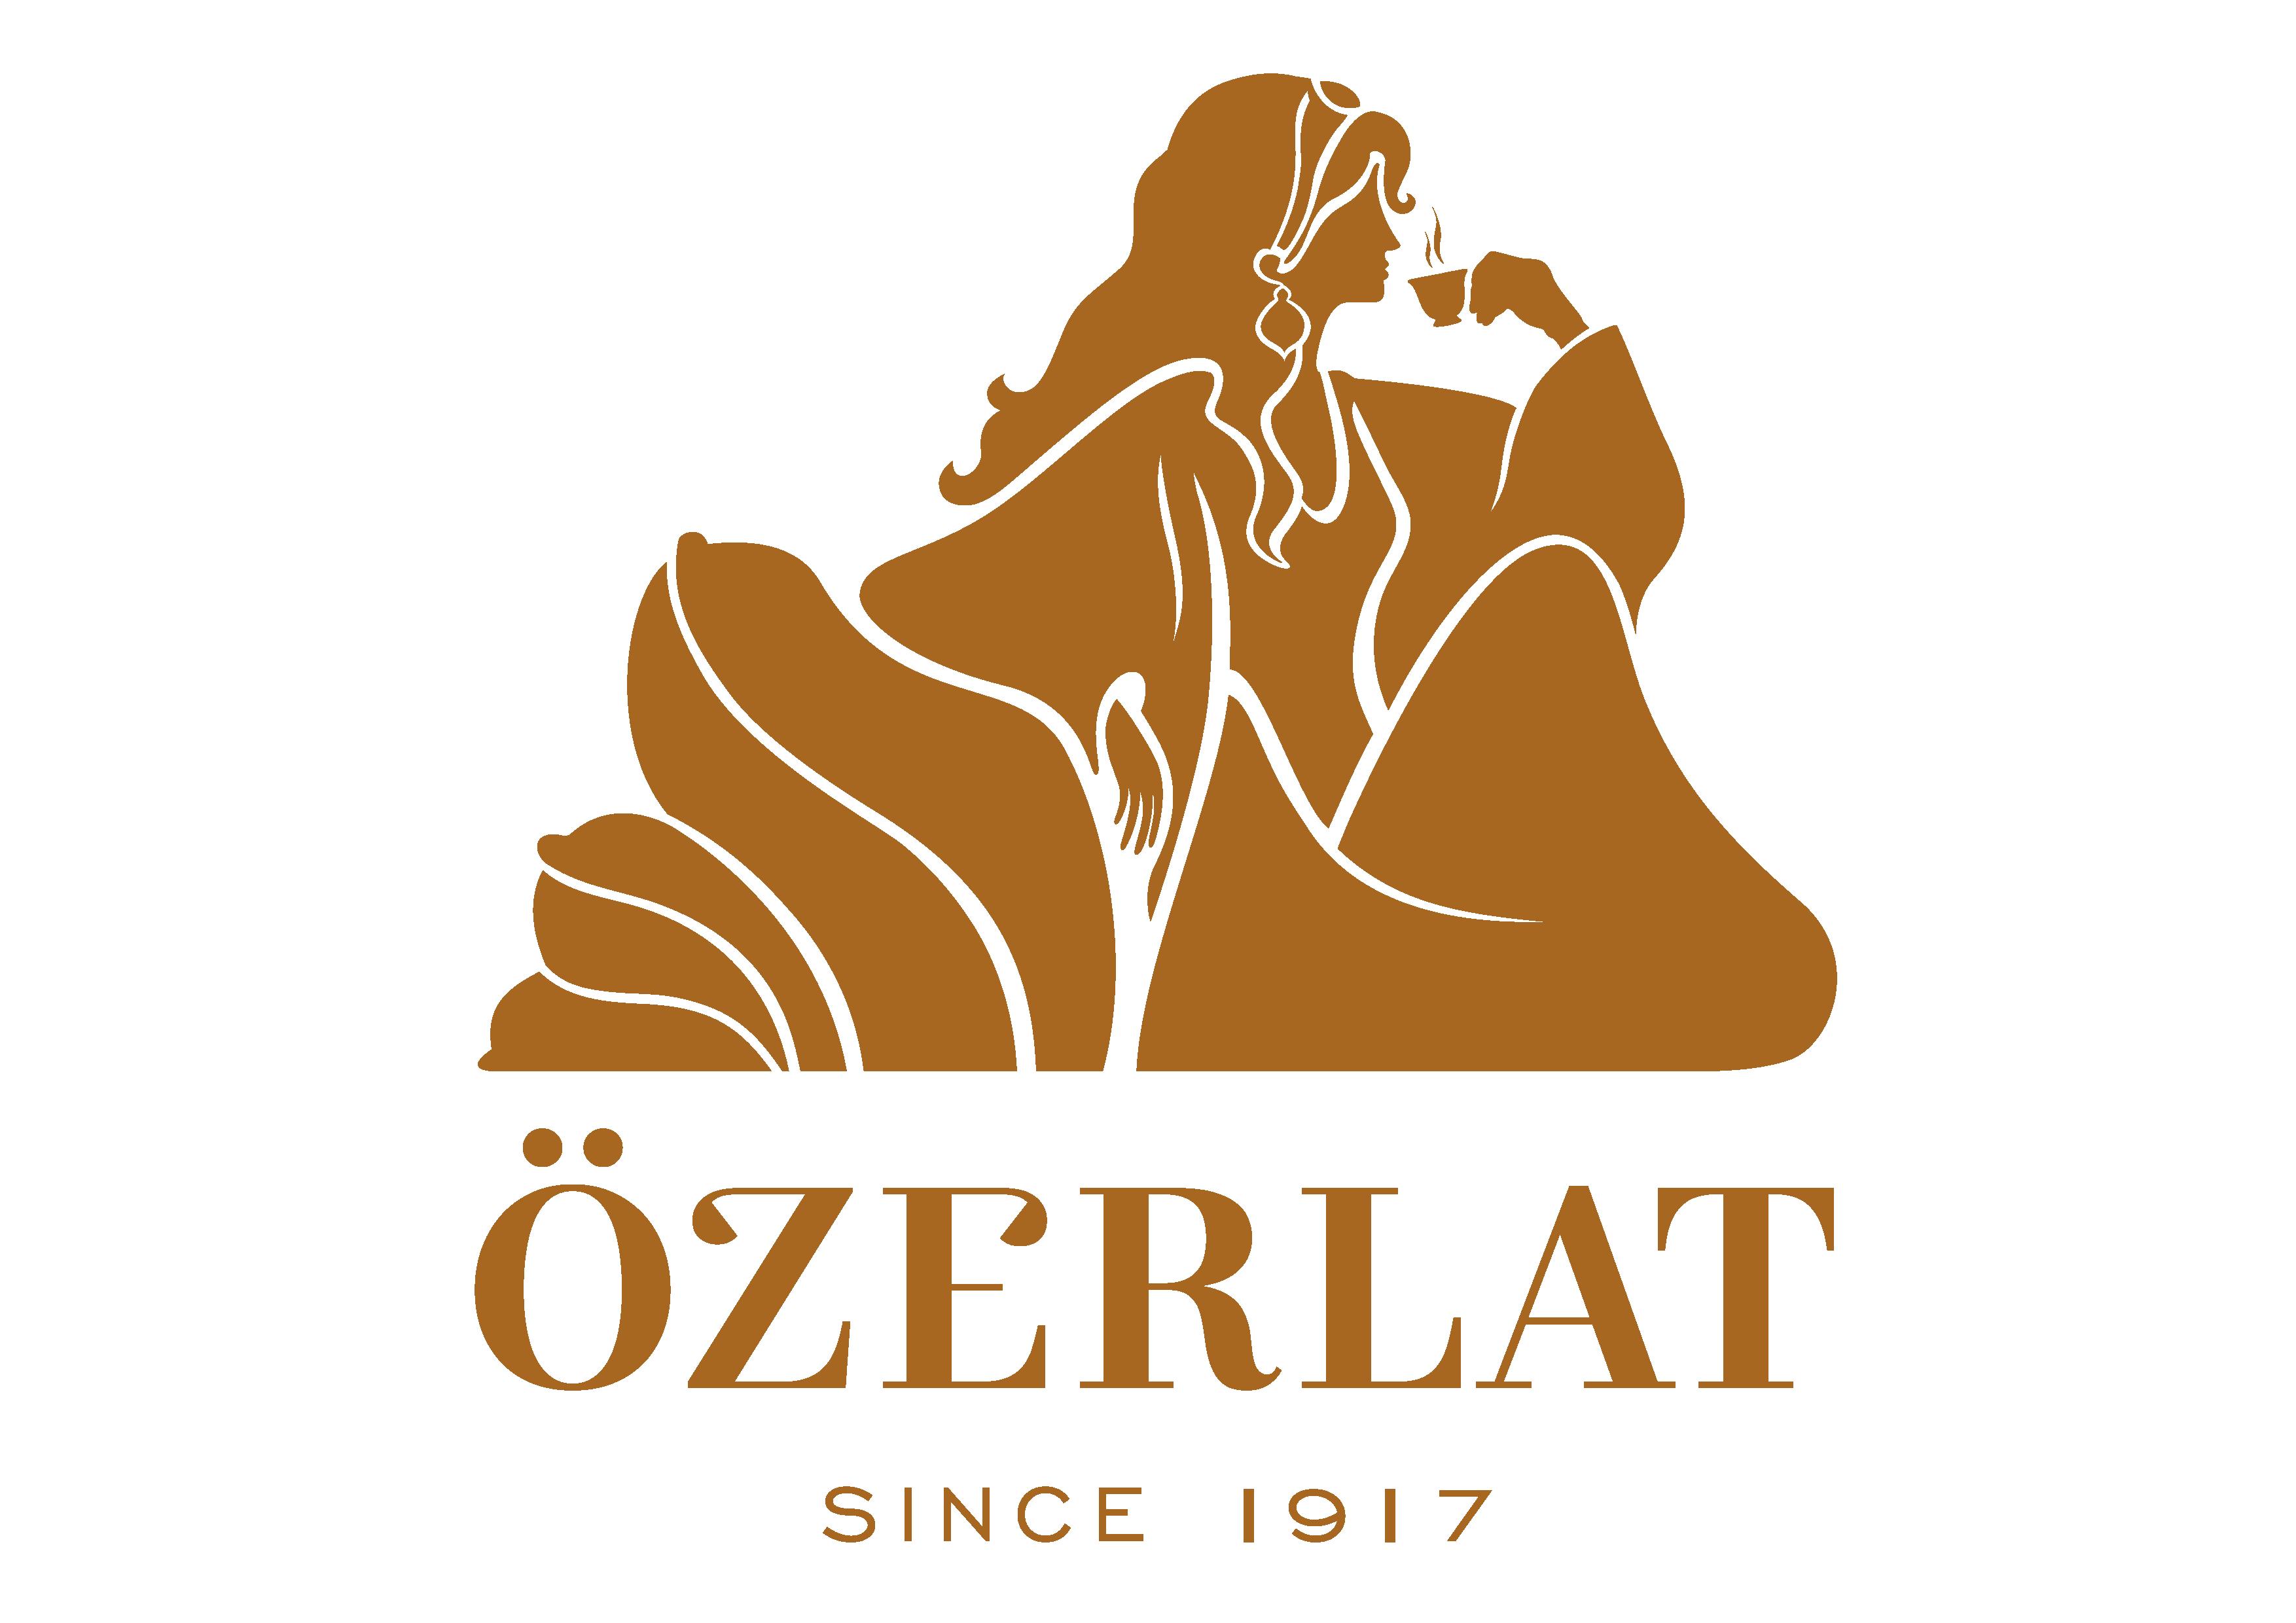 Ozerlat